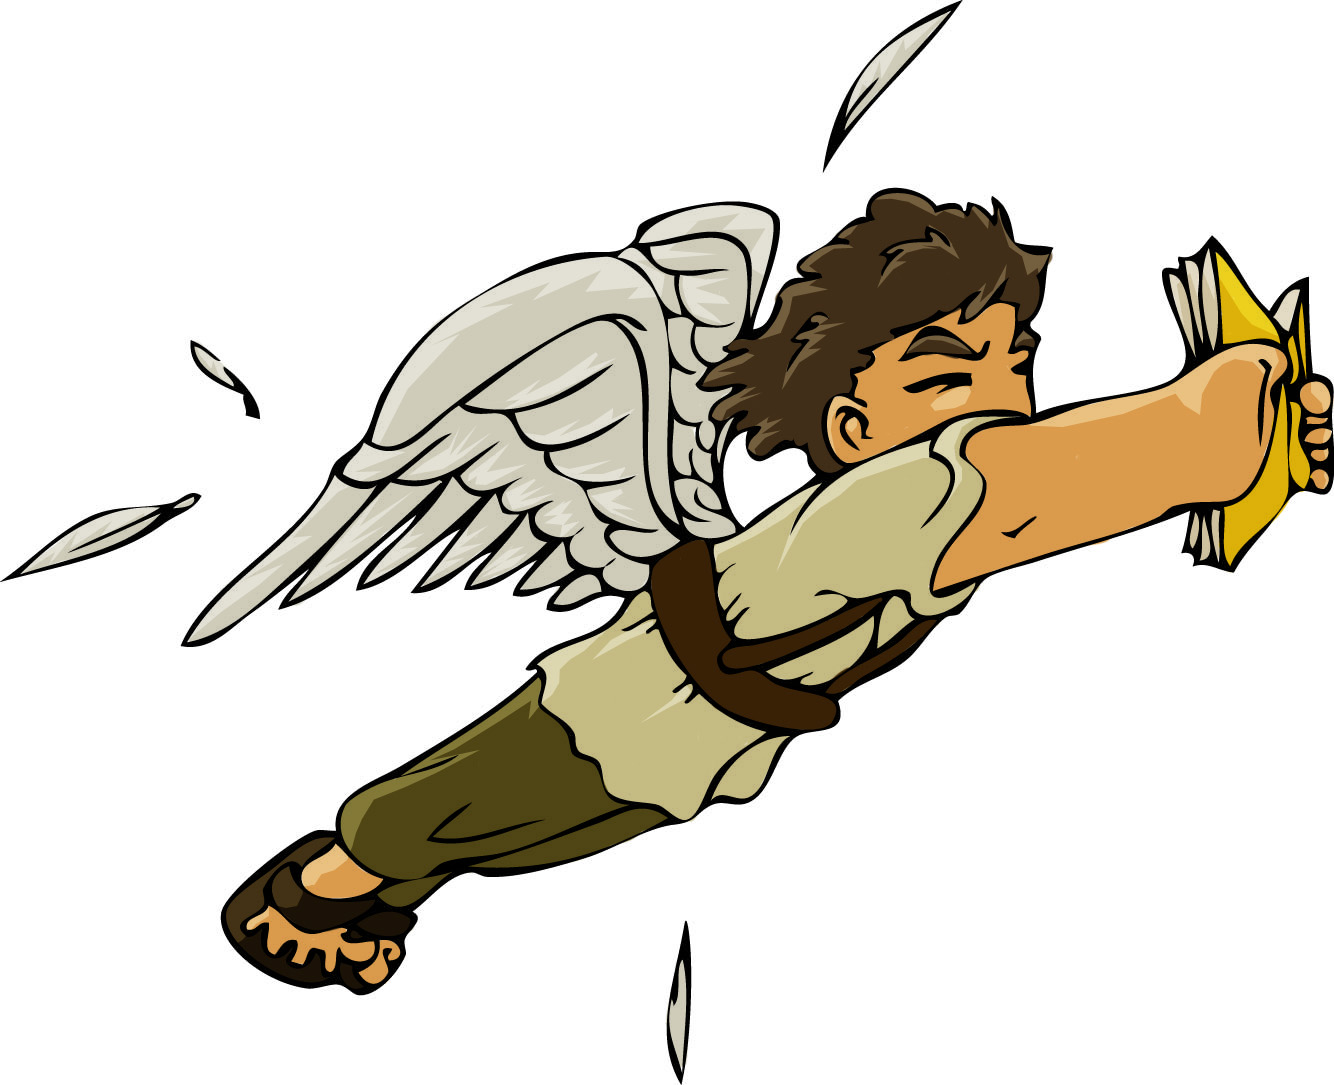 Free Icarus Cliparts, Download Free Clip Art, Free Clip Art.